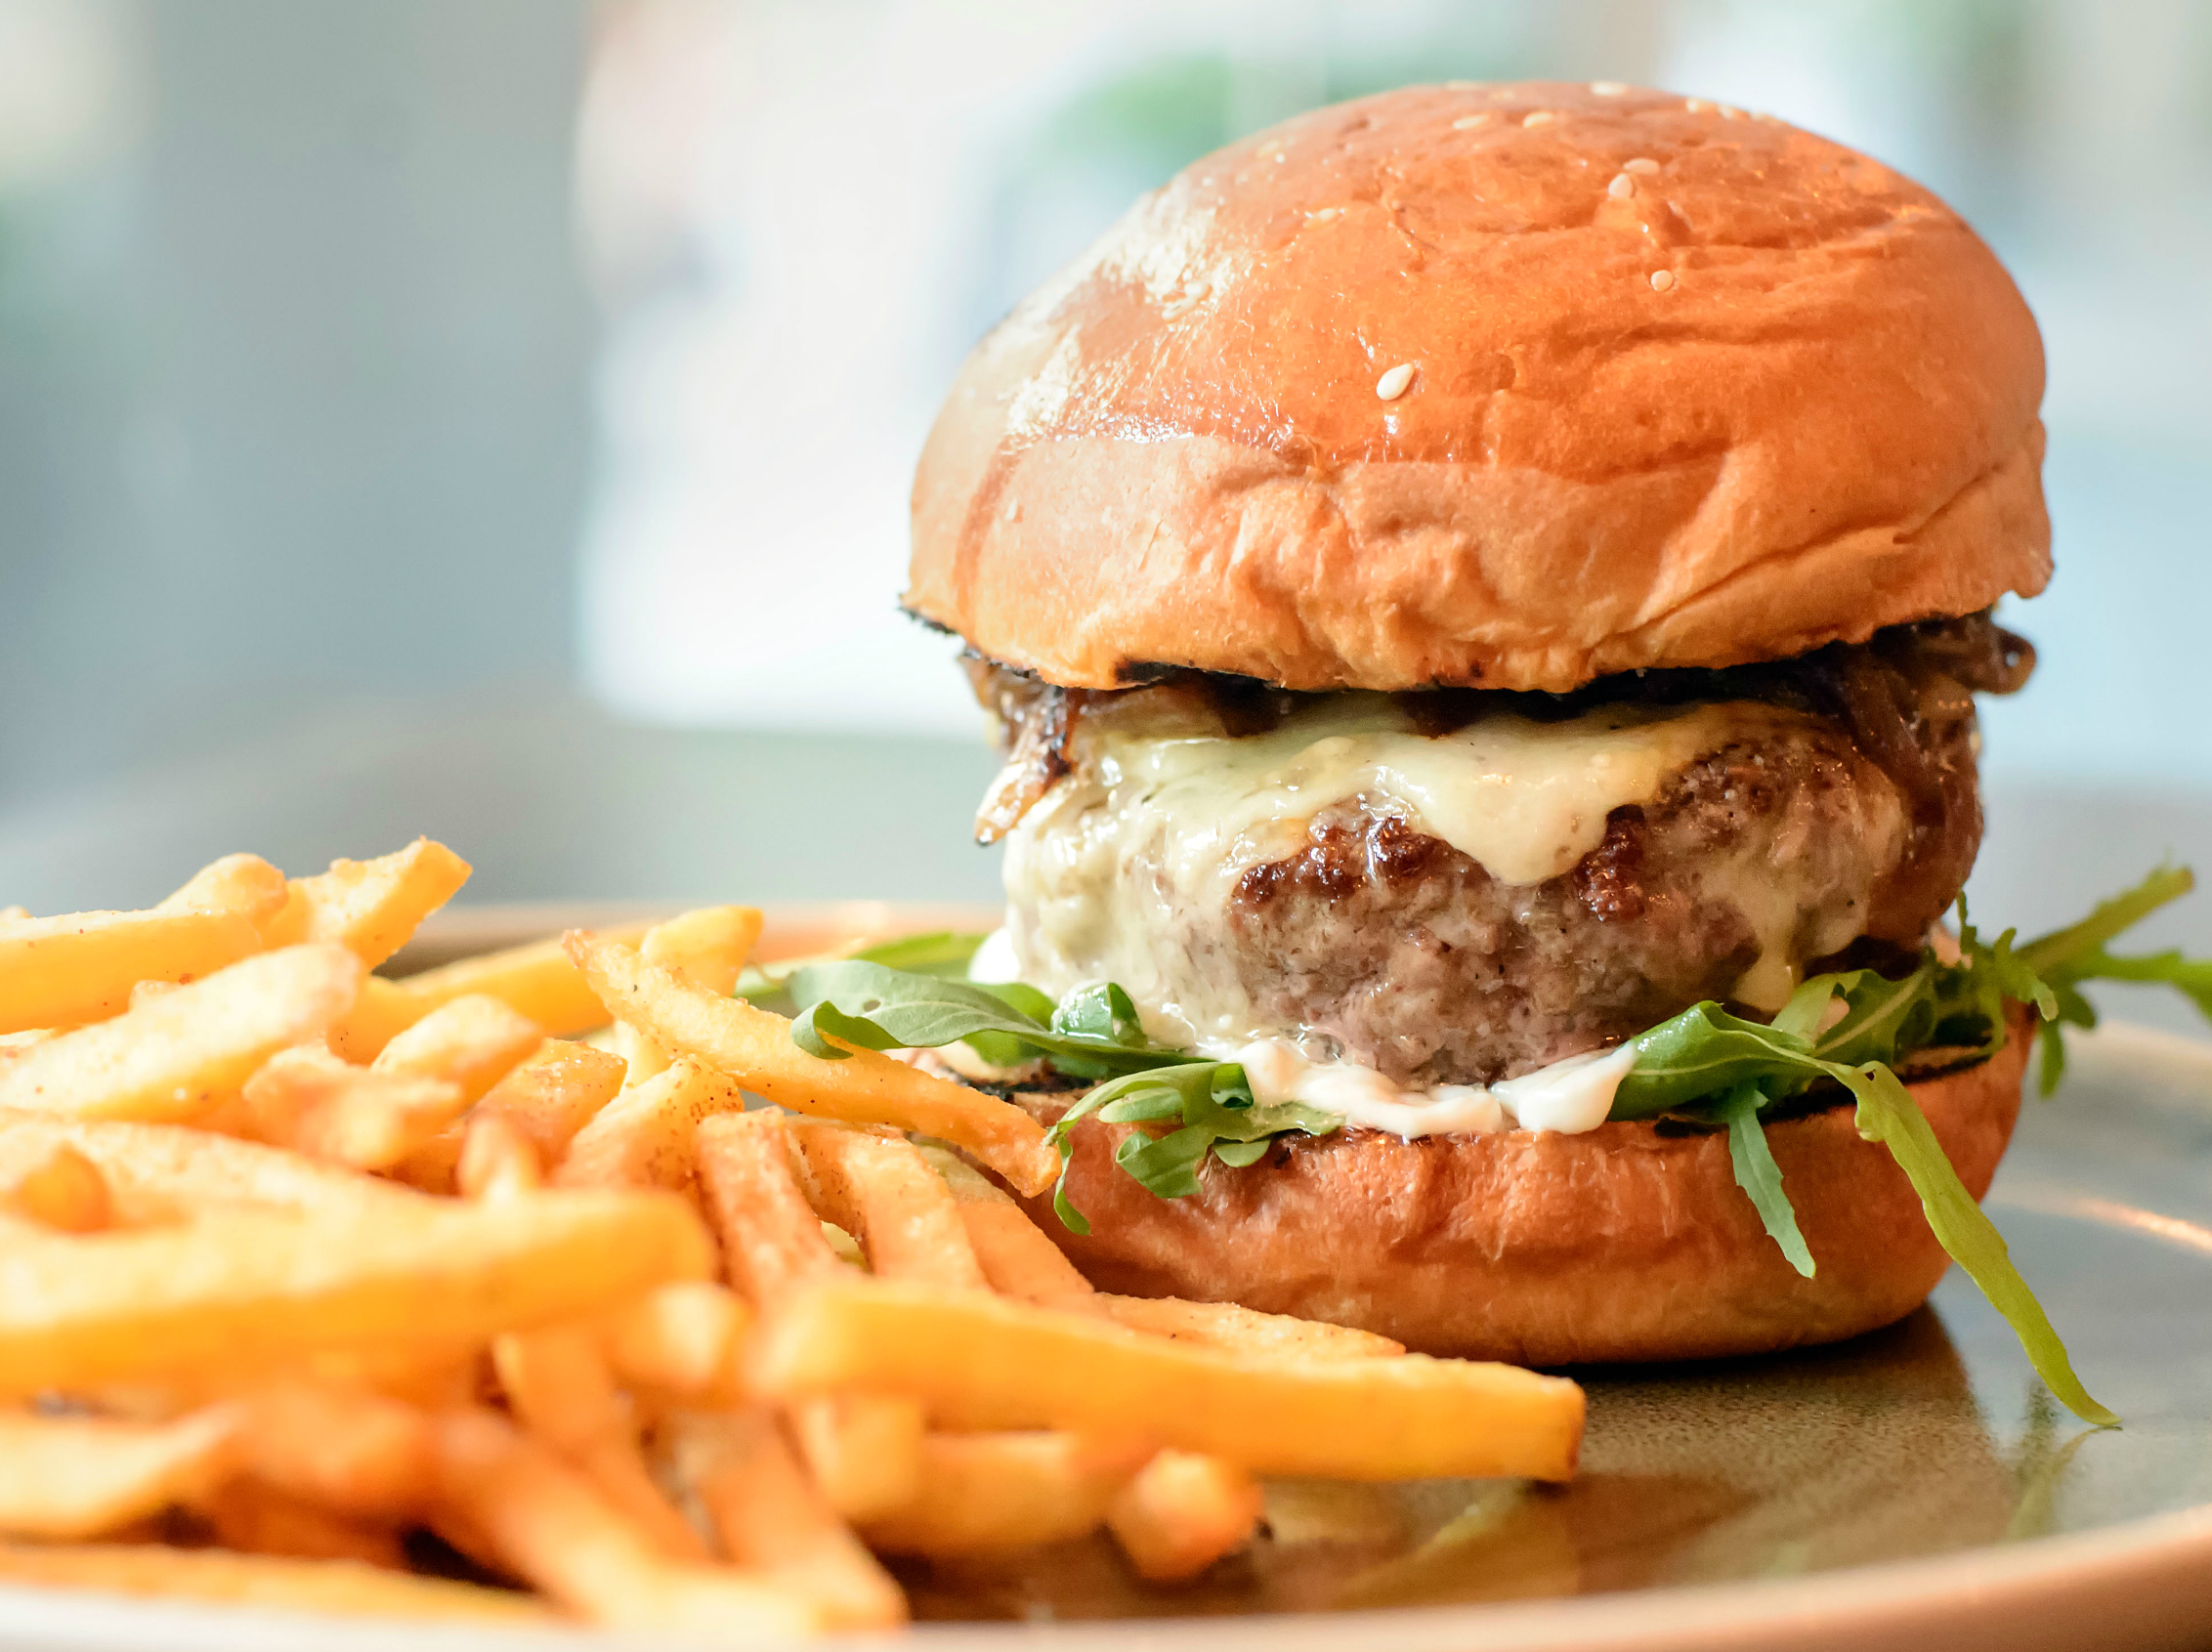 how to reheat a burger so it tastes